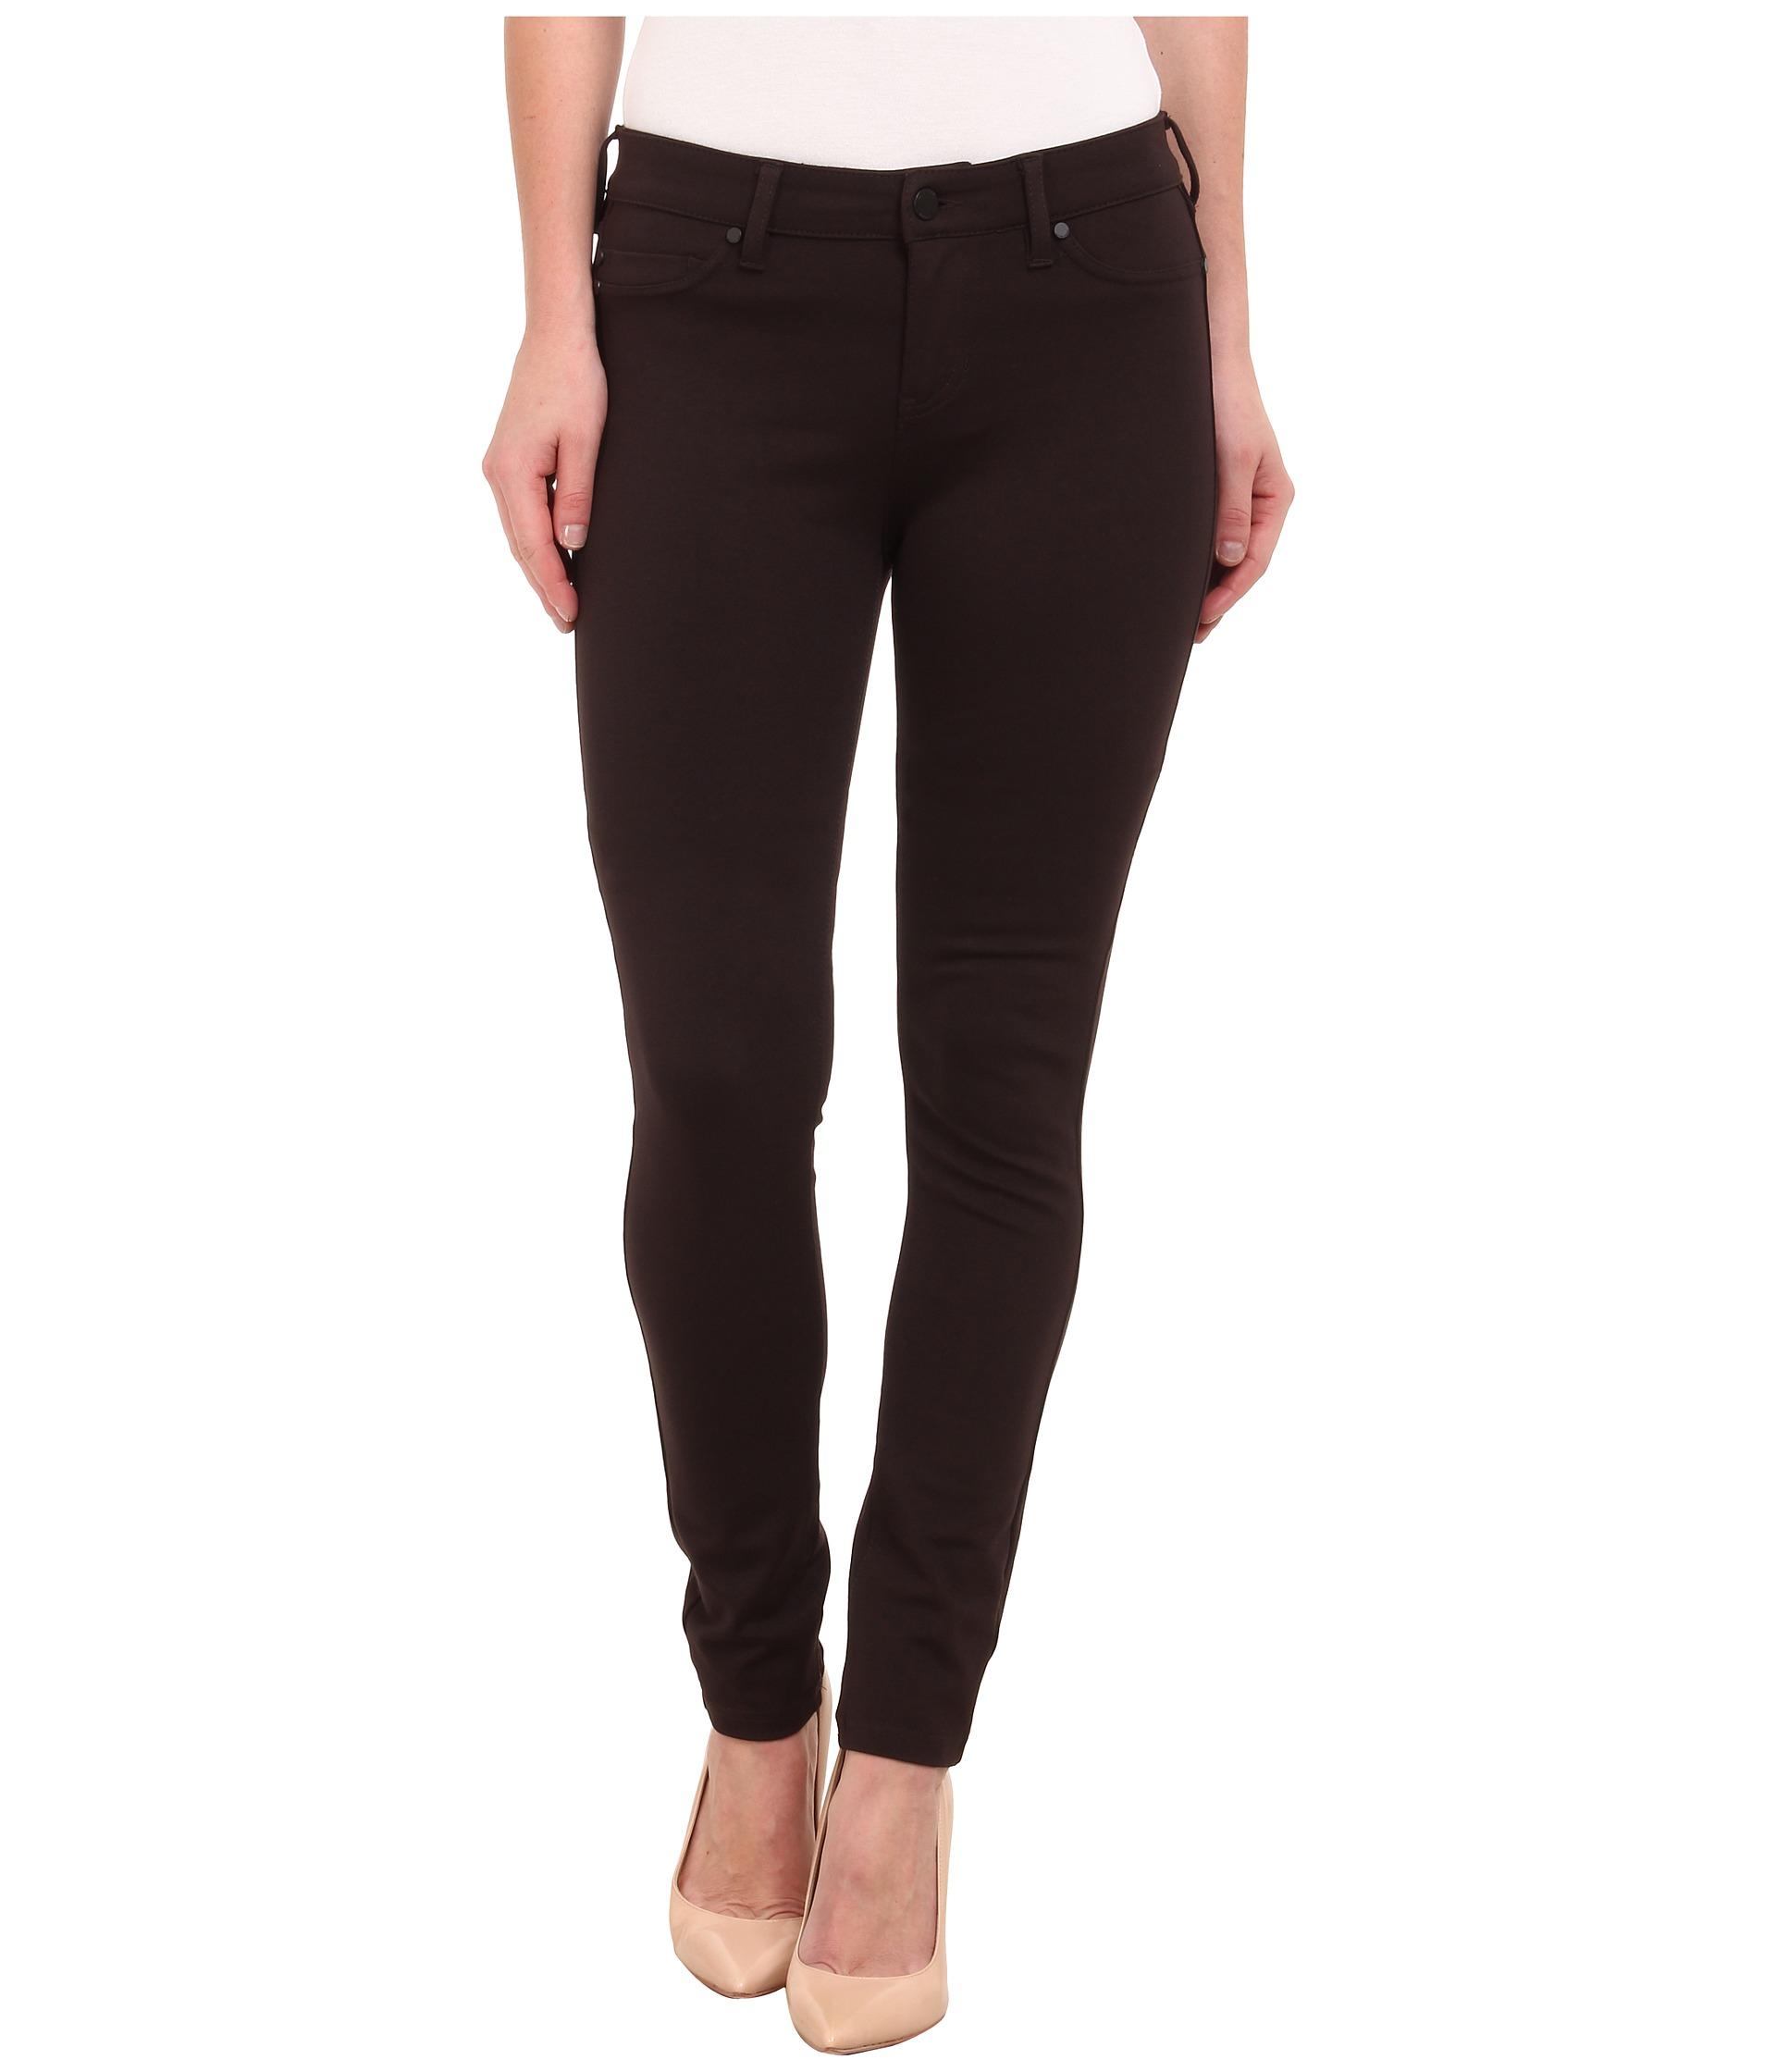 e2836198a0ba2 Liverpool Jeans Company Madonna Ponte Five-pocket Legging in Black ...